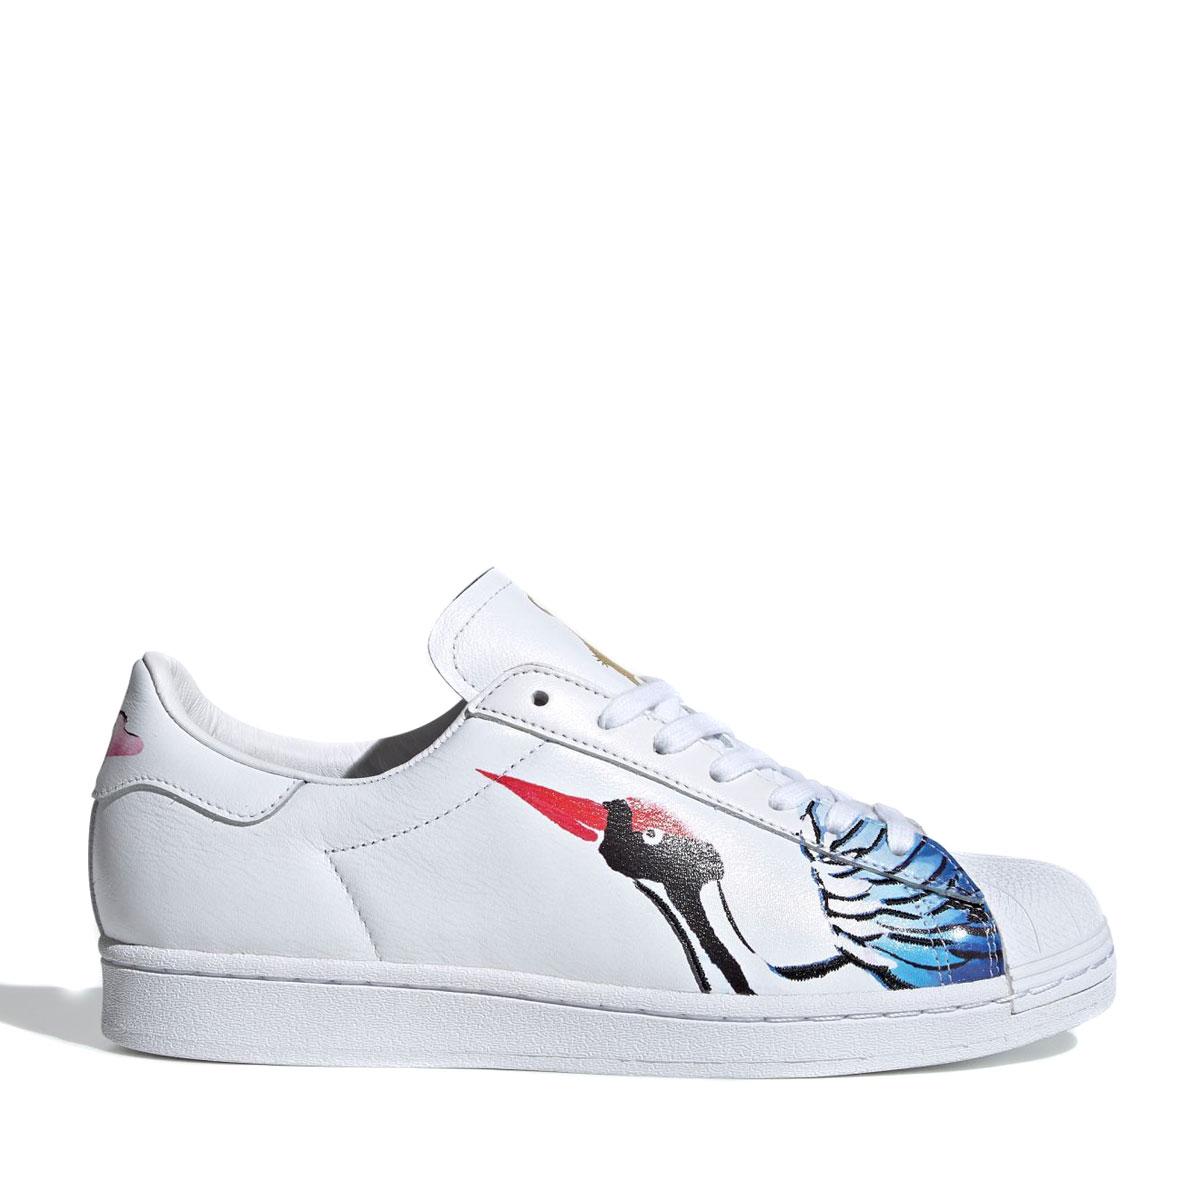 adidas SUPERSTAR(FOOTWEAR WHITE/FOOTWEAR WHITE/GOLD METARIC)(アディダス スーパースター)【メンズ】【レディース】【スニーカー】【20SS-I】